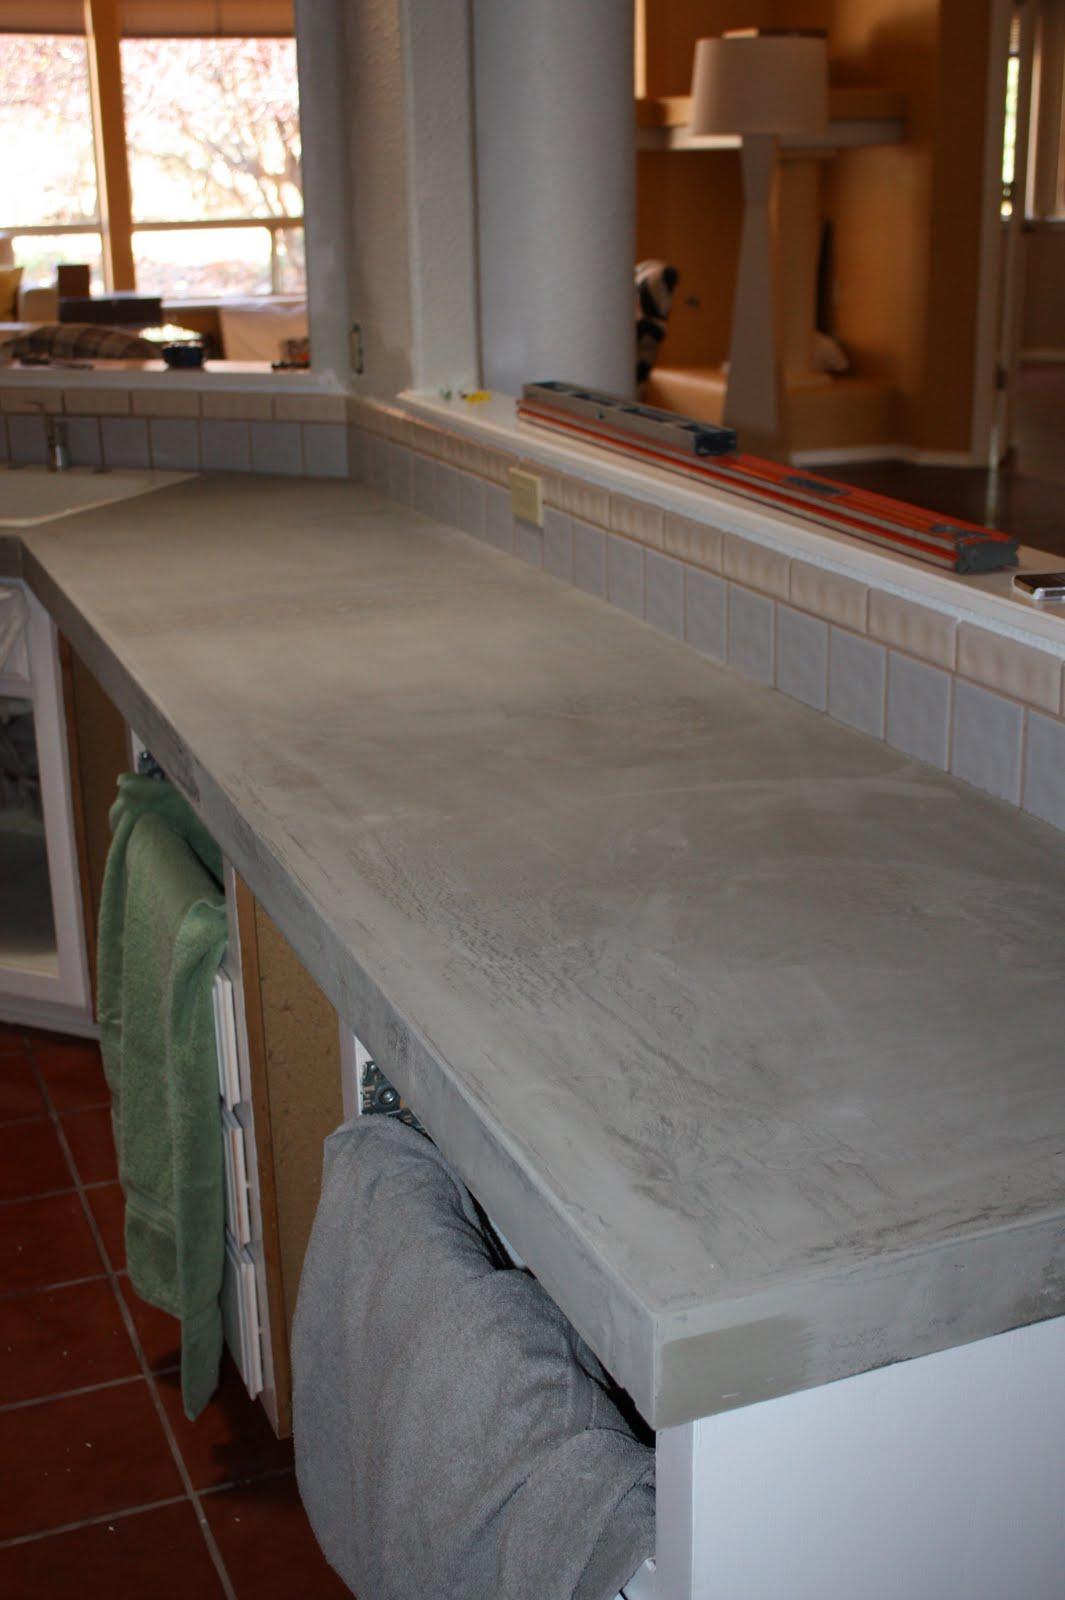 Design stocker concrete countertops for How durable are concrete countertops